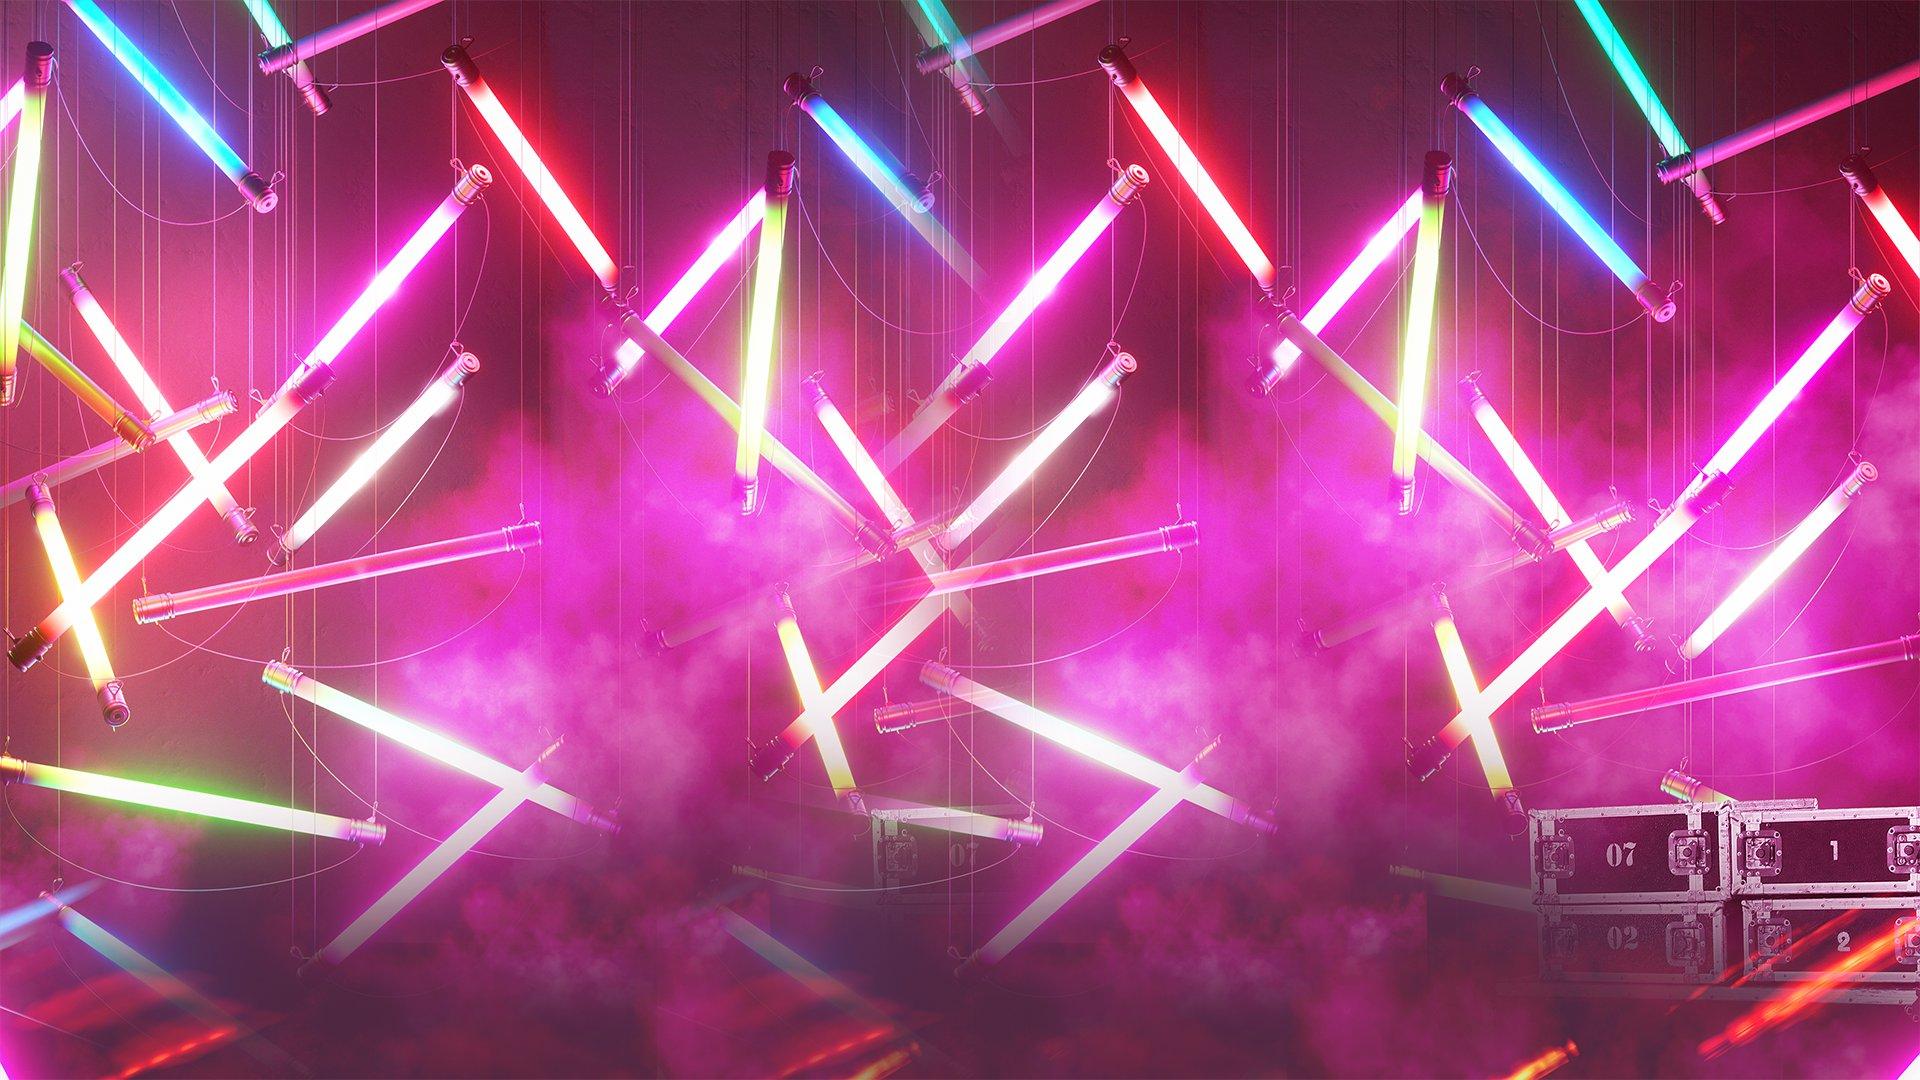 fond The Voice Kids 2020 - Finale - Ema chante « Your Song » d'Elton John (Team Patrick Fiori)